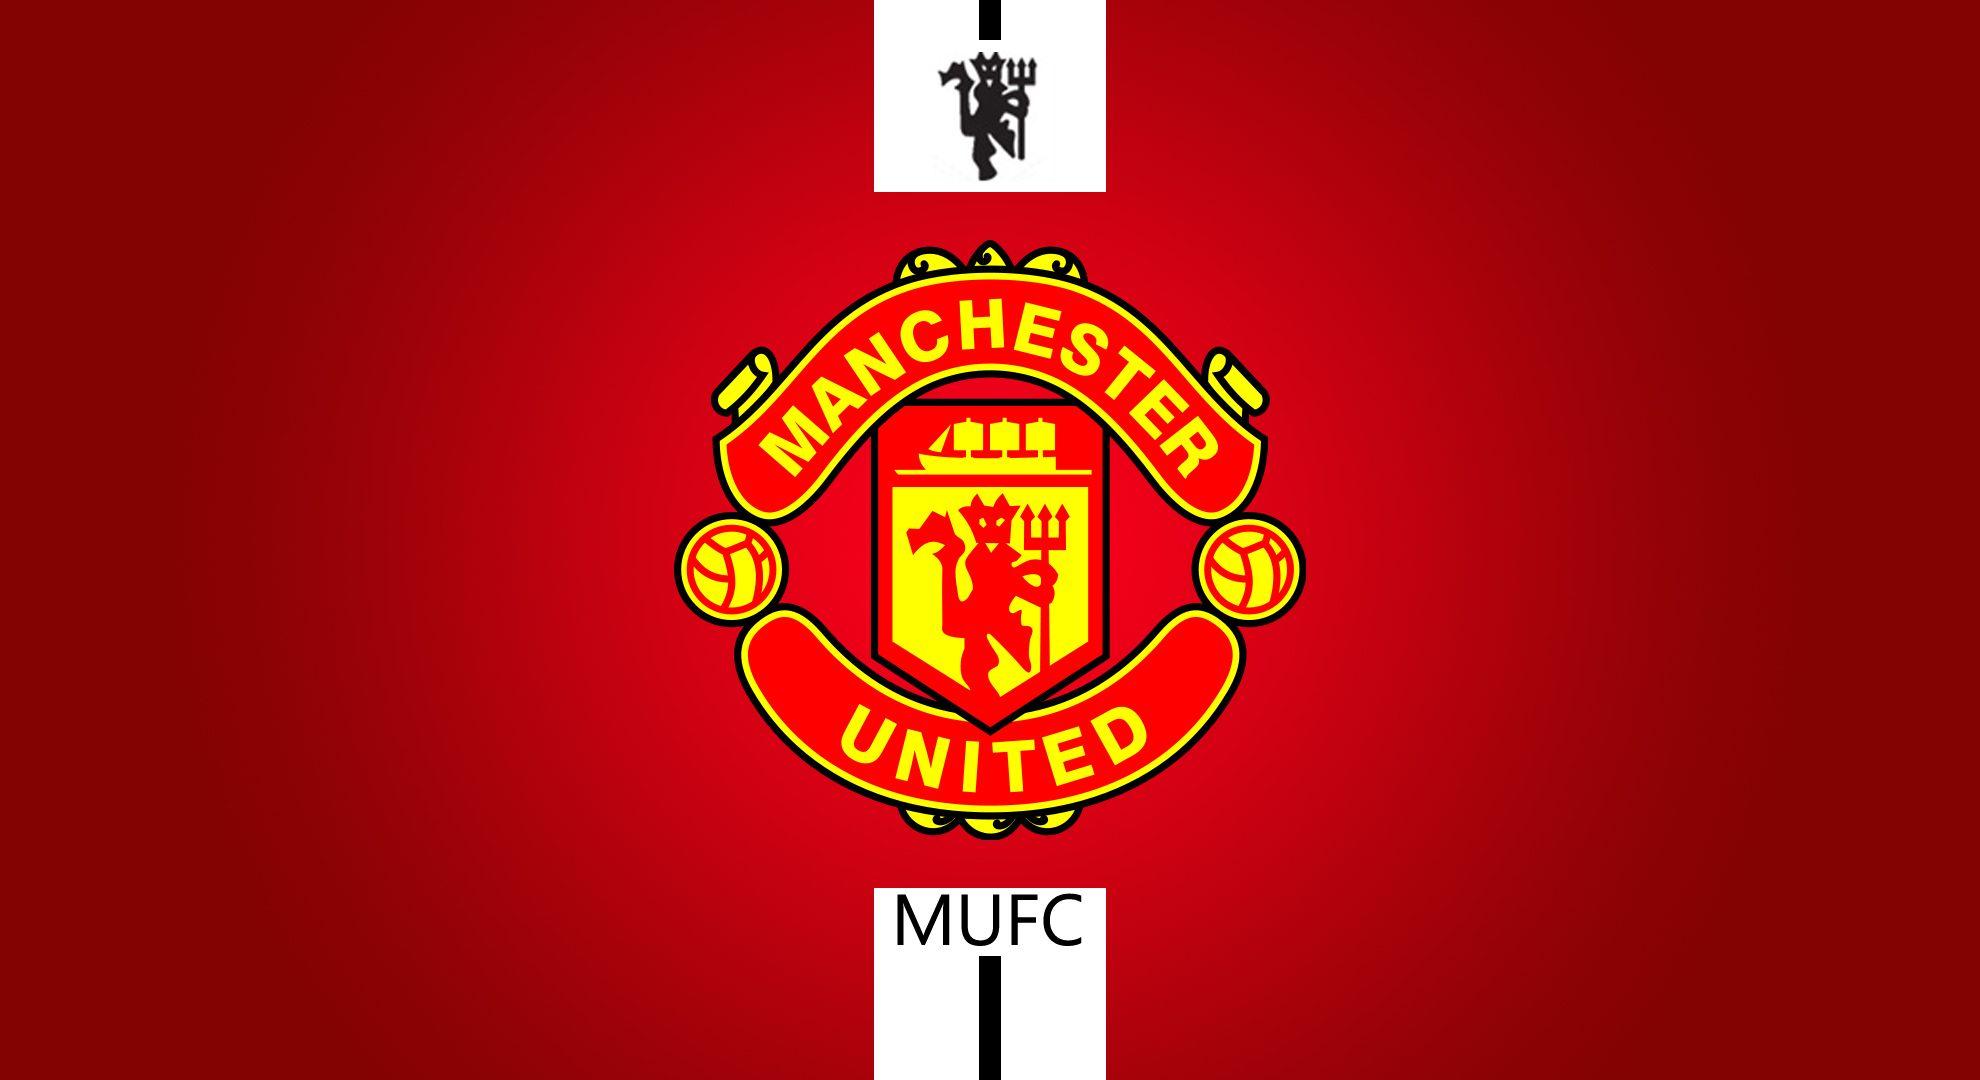 Manchester United Sepak Bola Old Trafford Manchester United